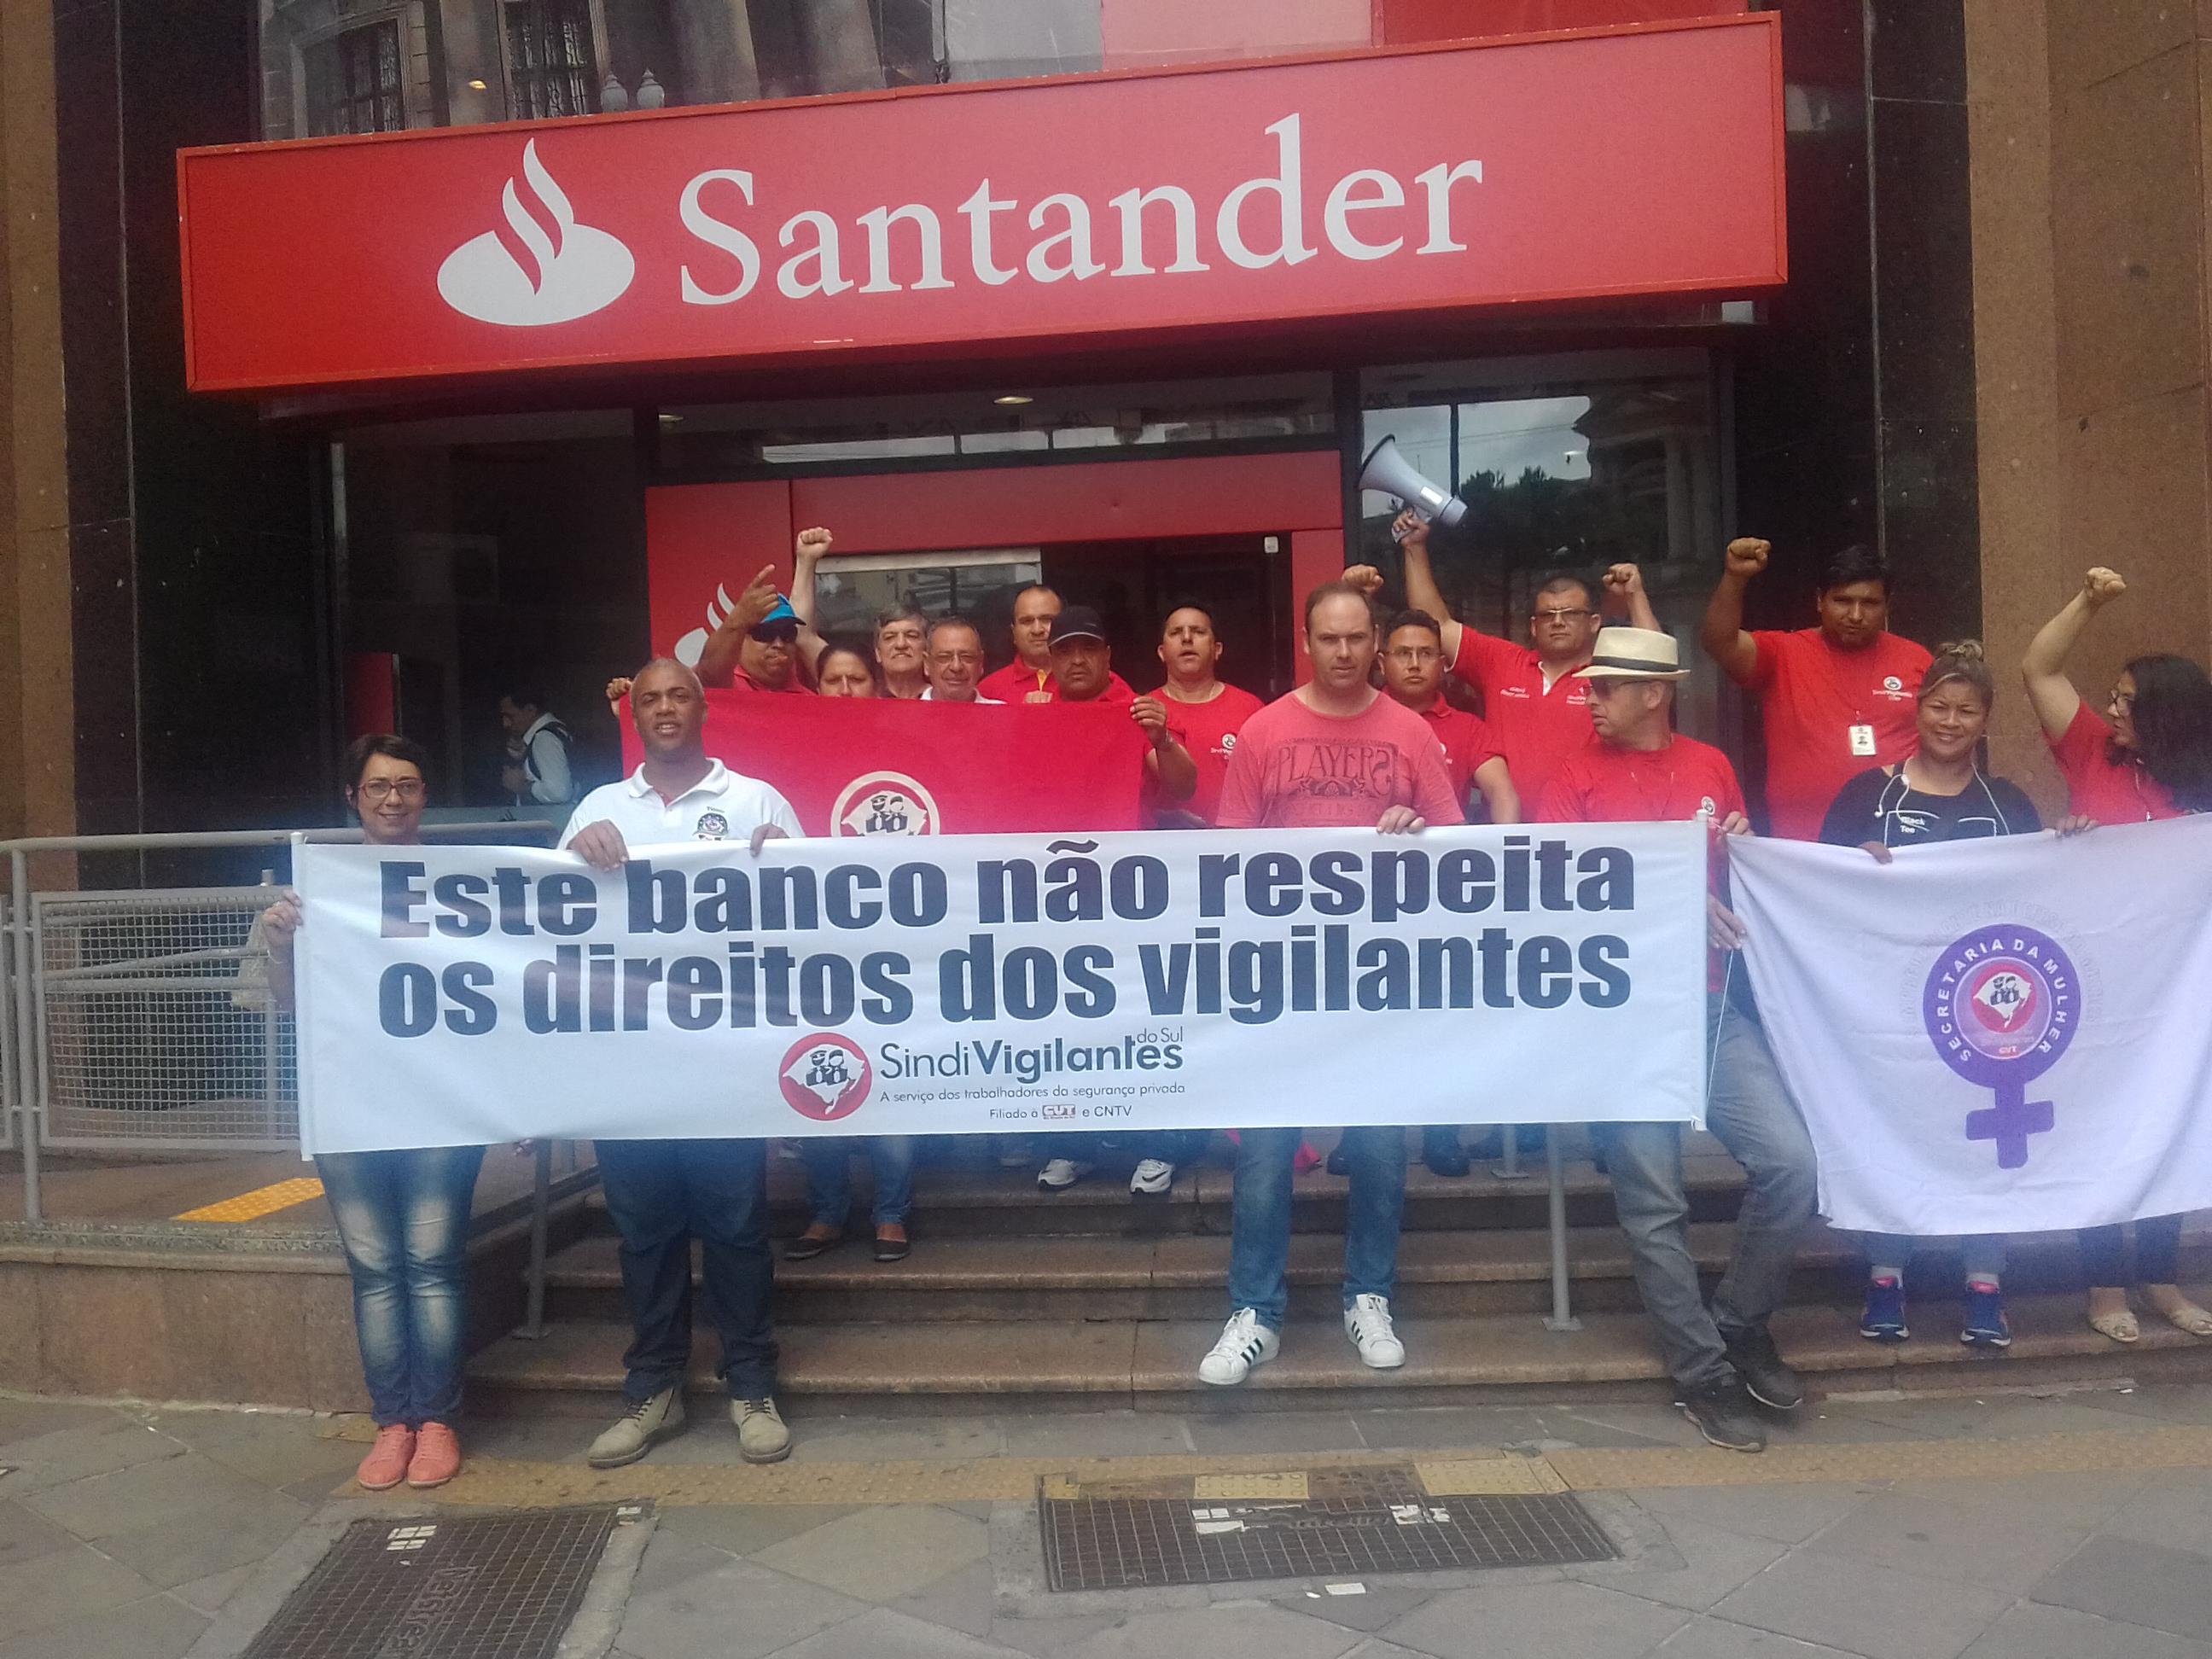 Santander vigilantes